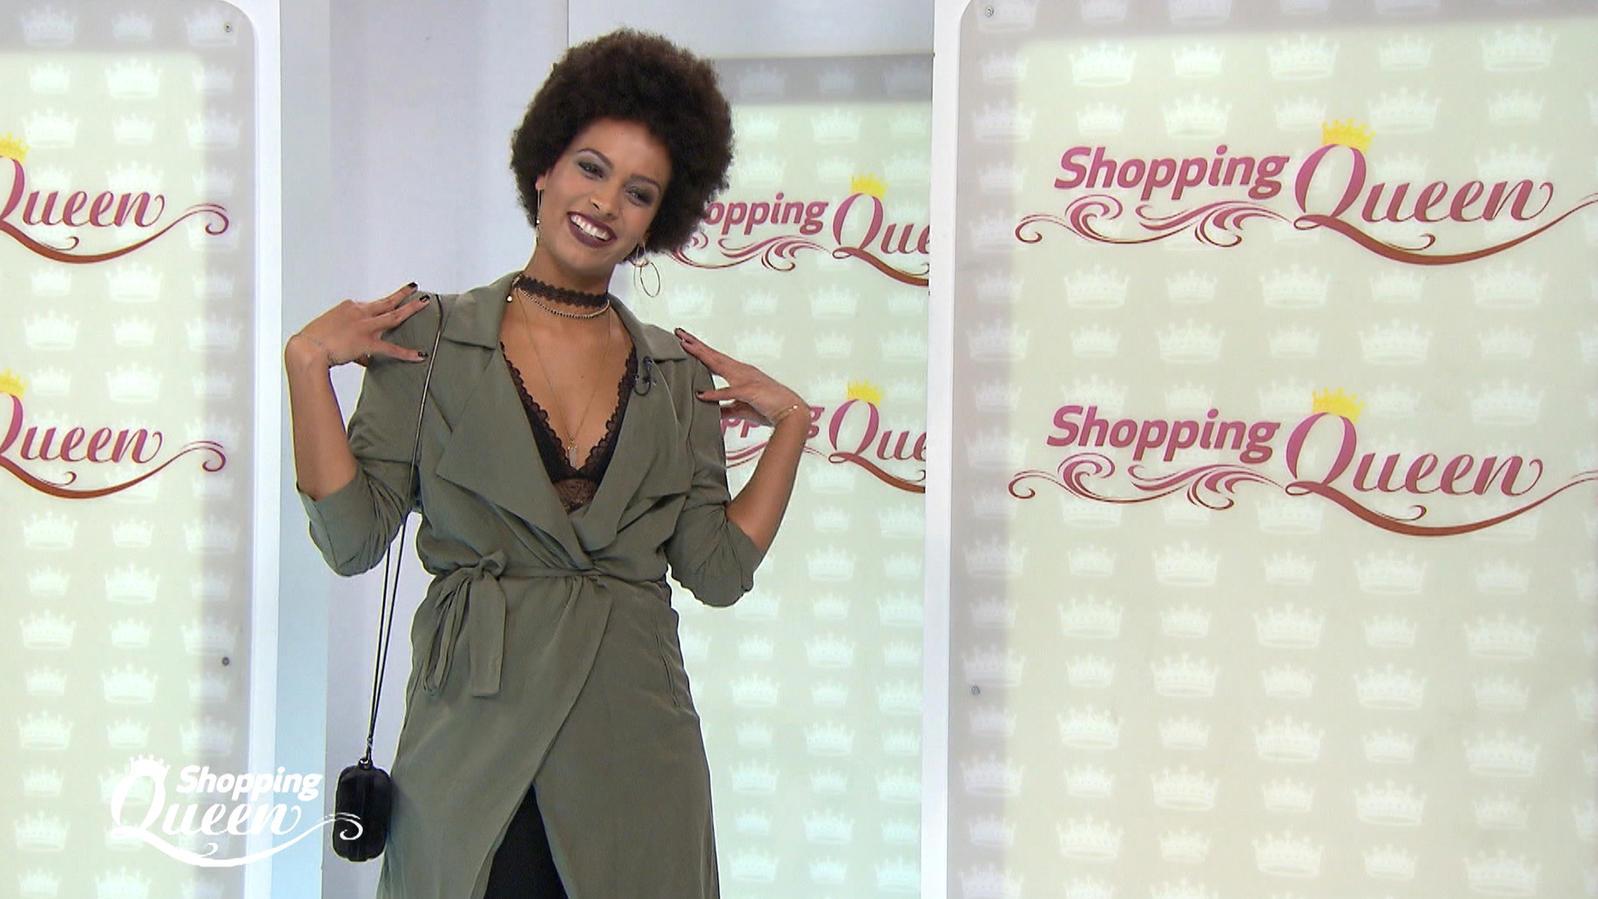 shopping queen hannover